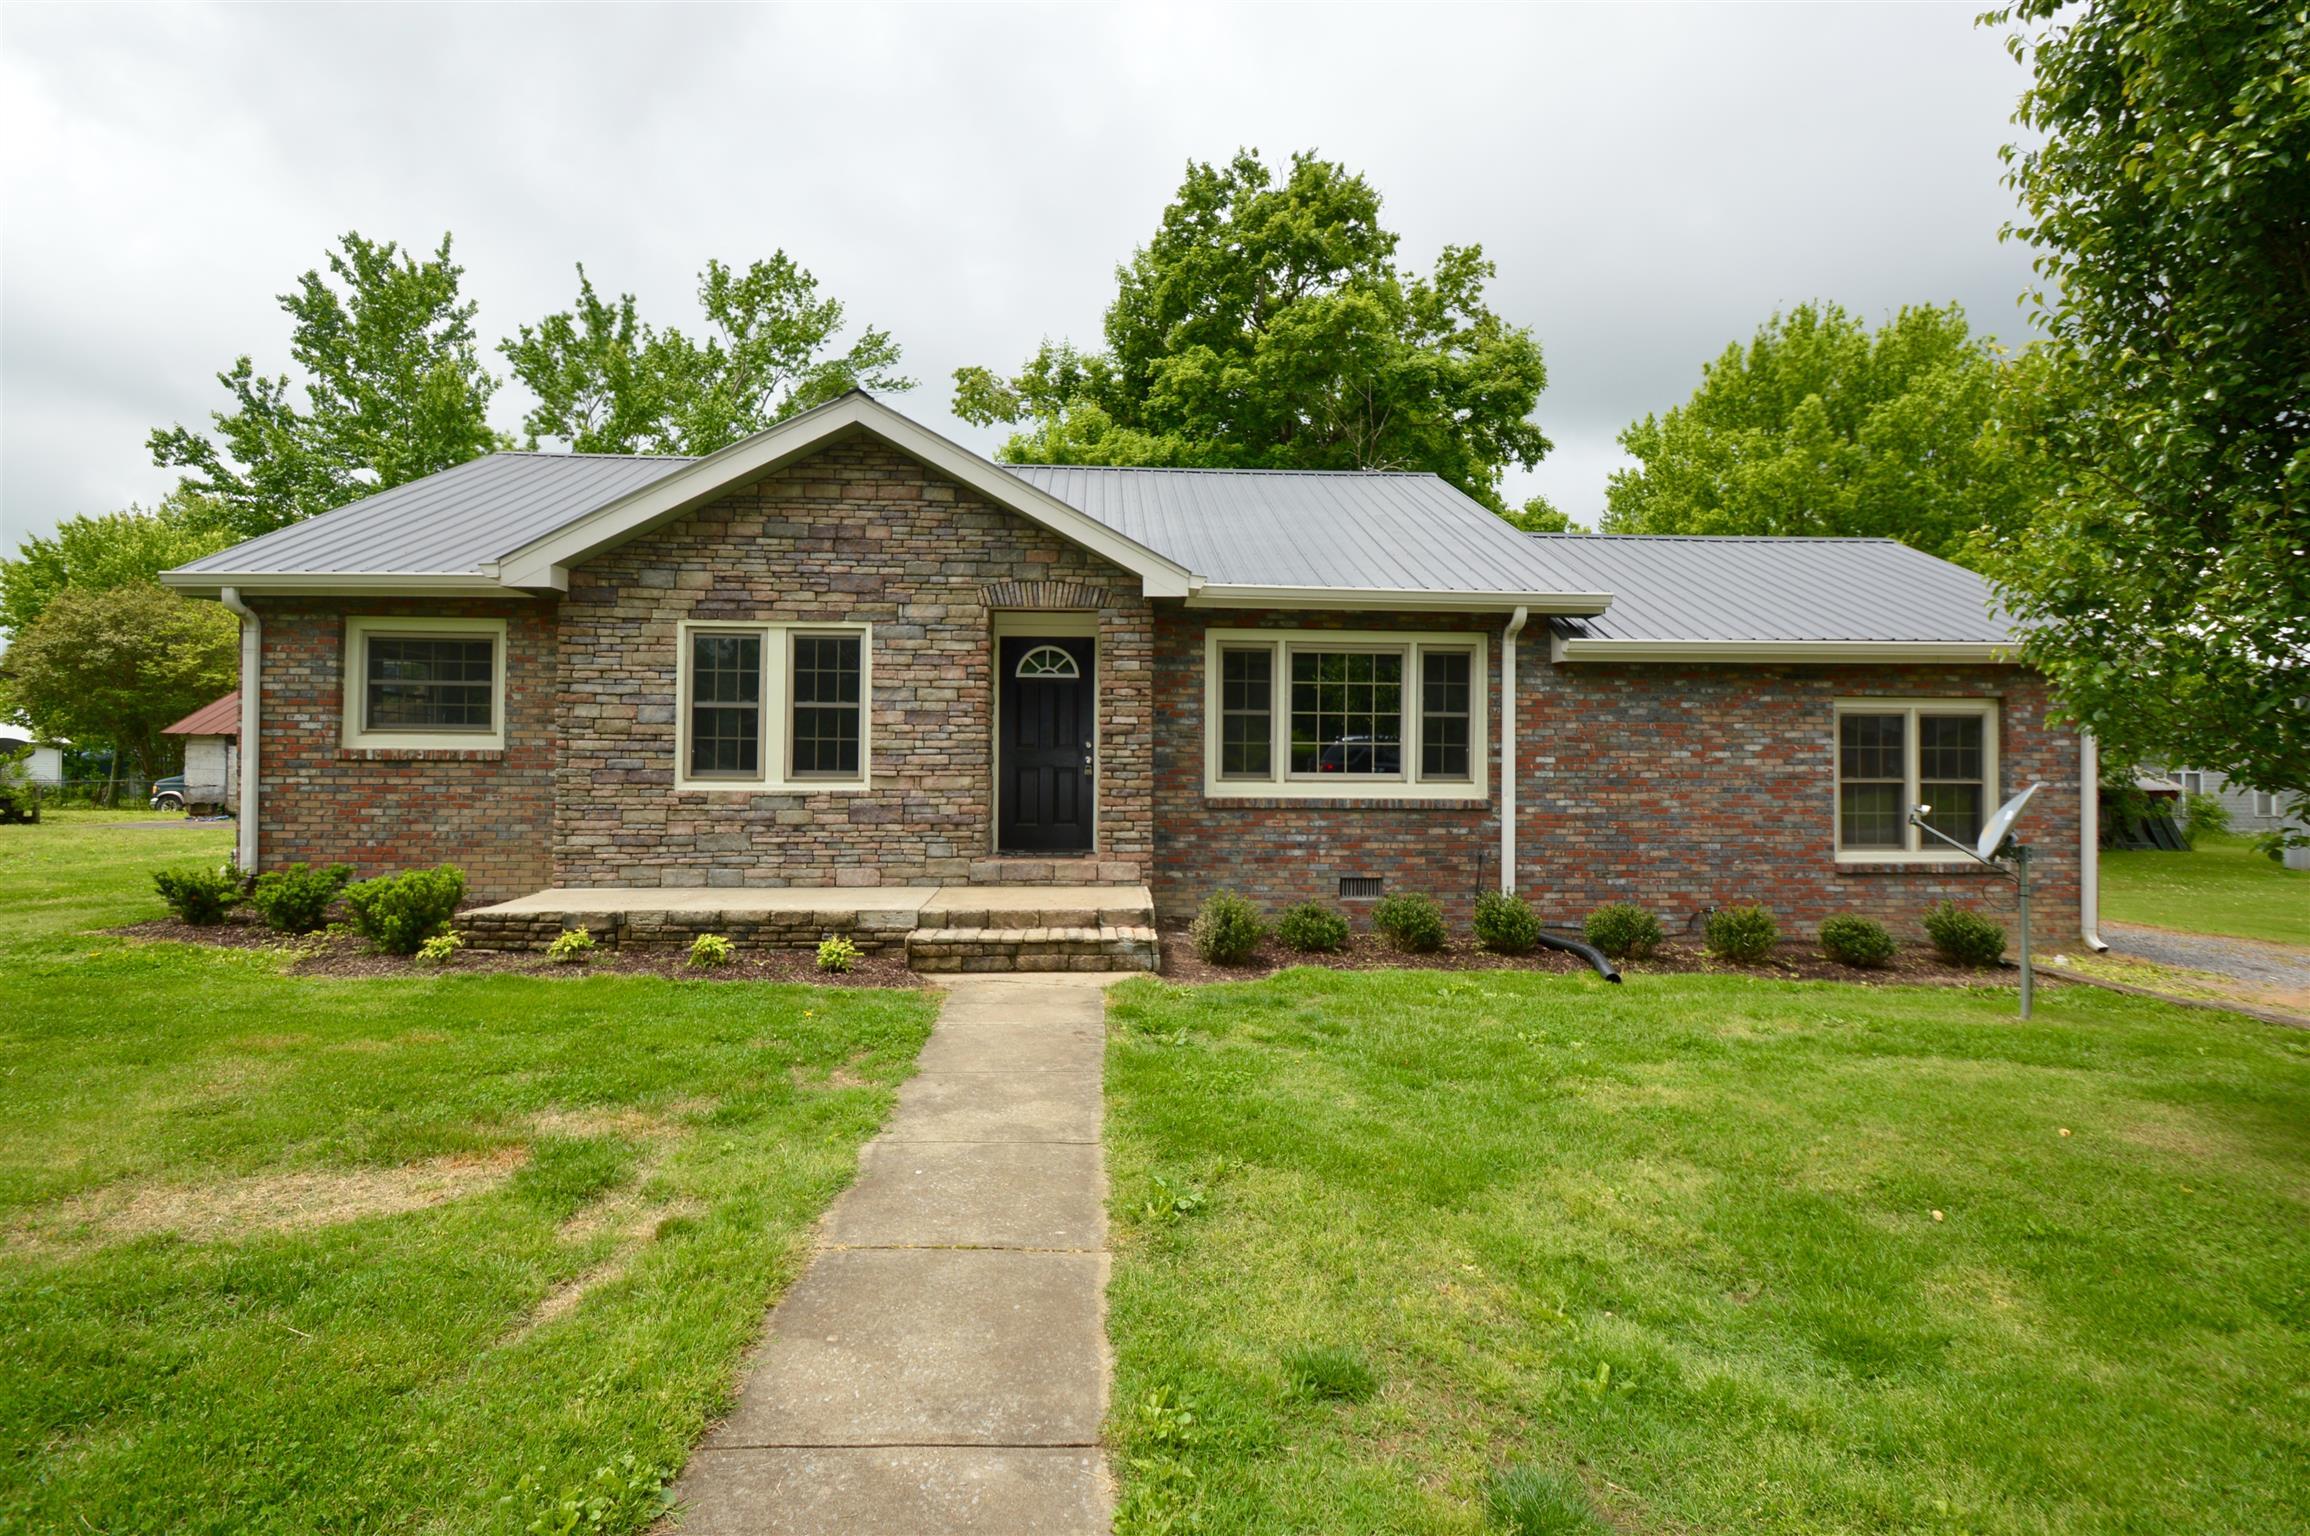 91 Church St, MC EWEN, TN 37101 - MC EWEN, TN real estate listing